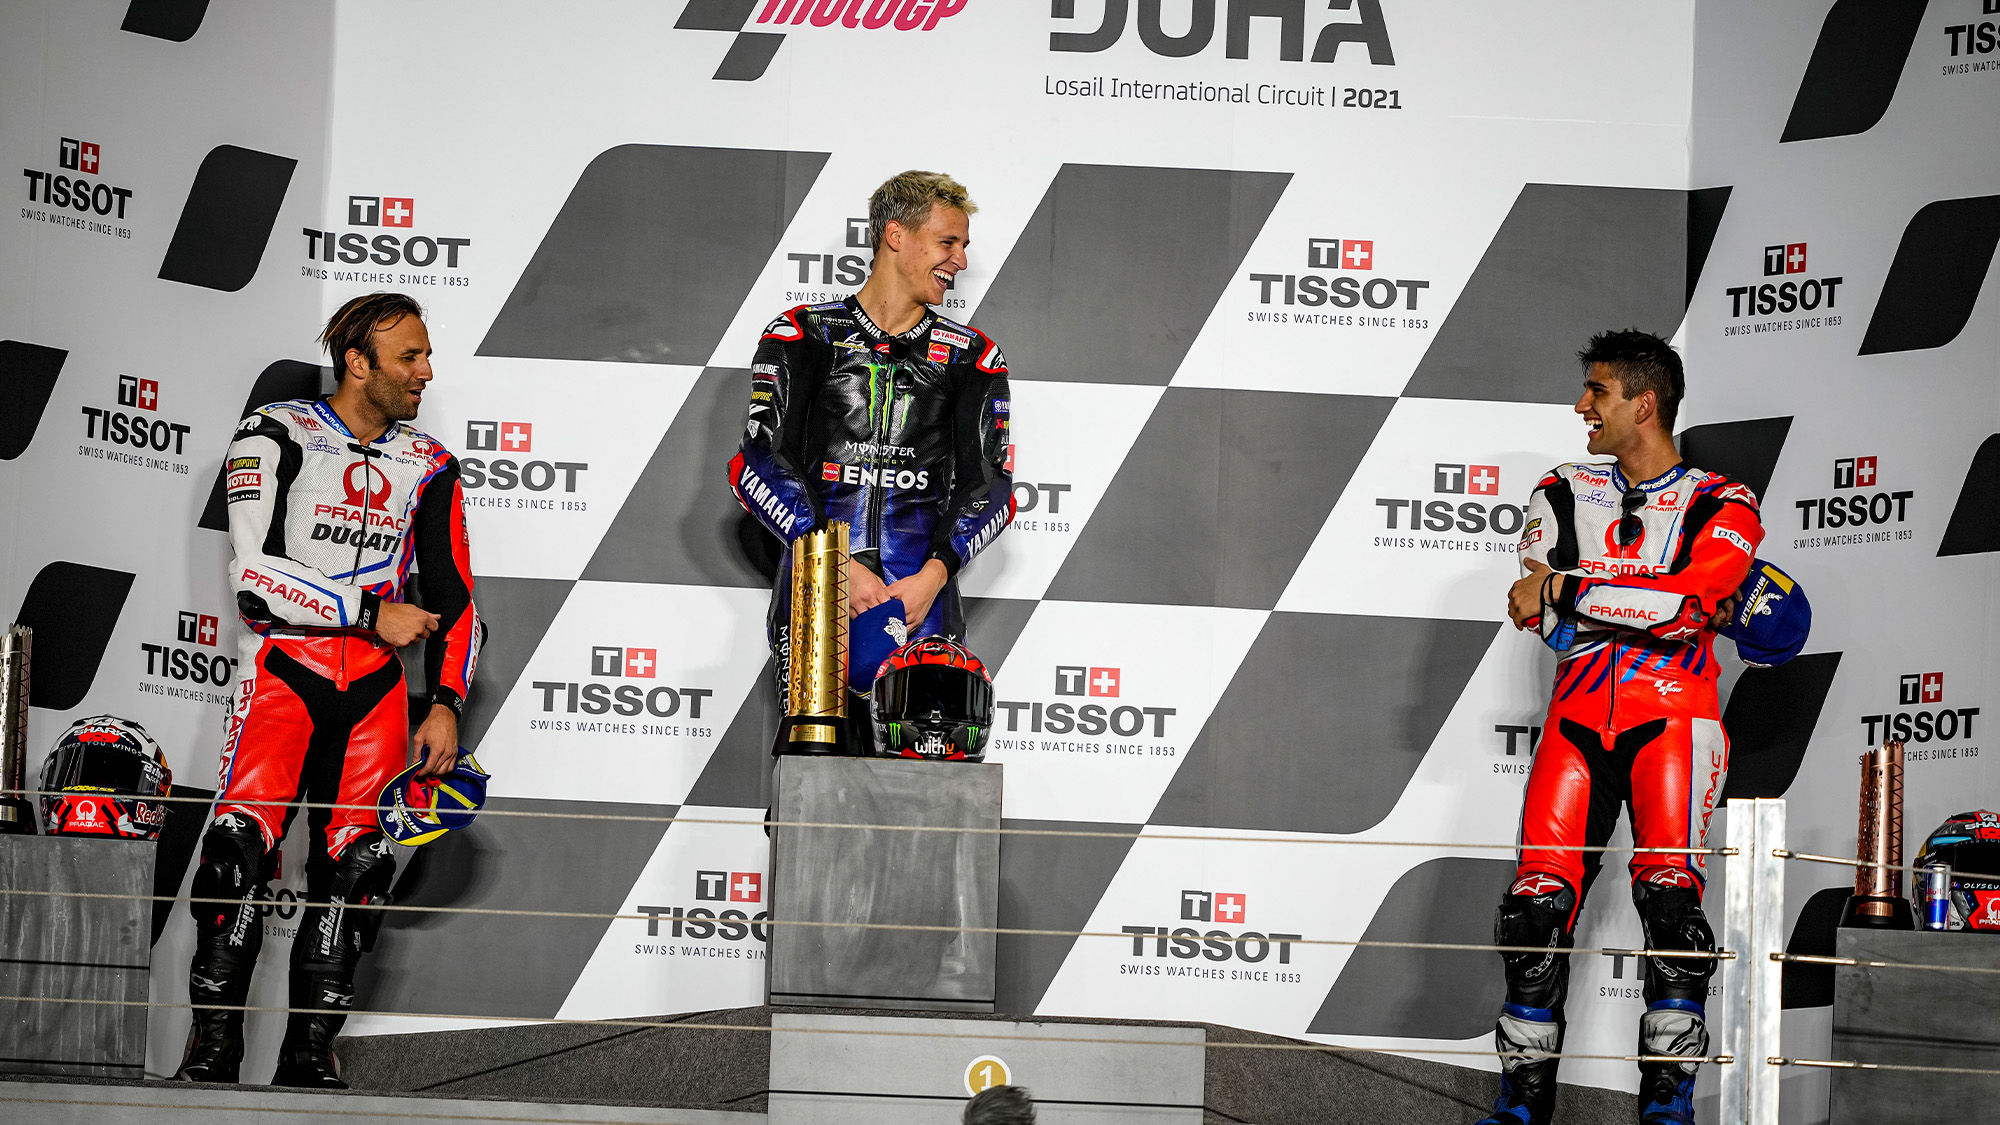 MotoGP podium in Doha 2021